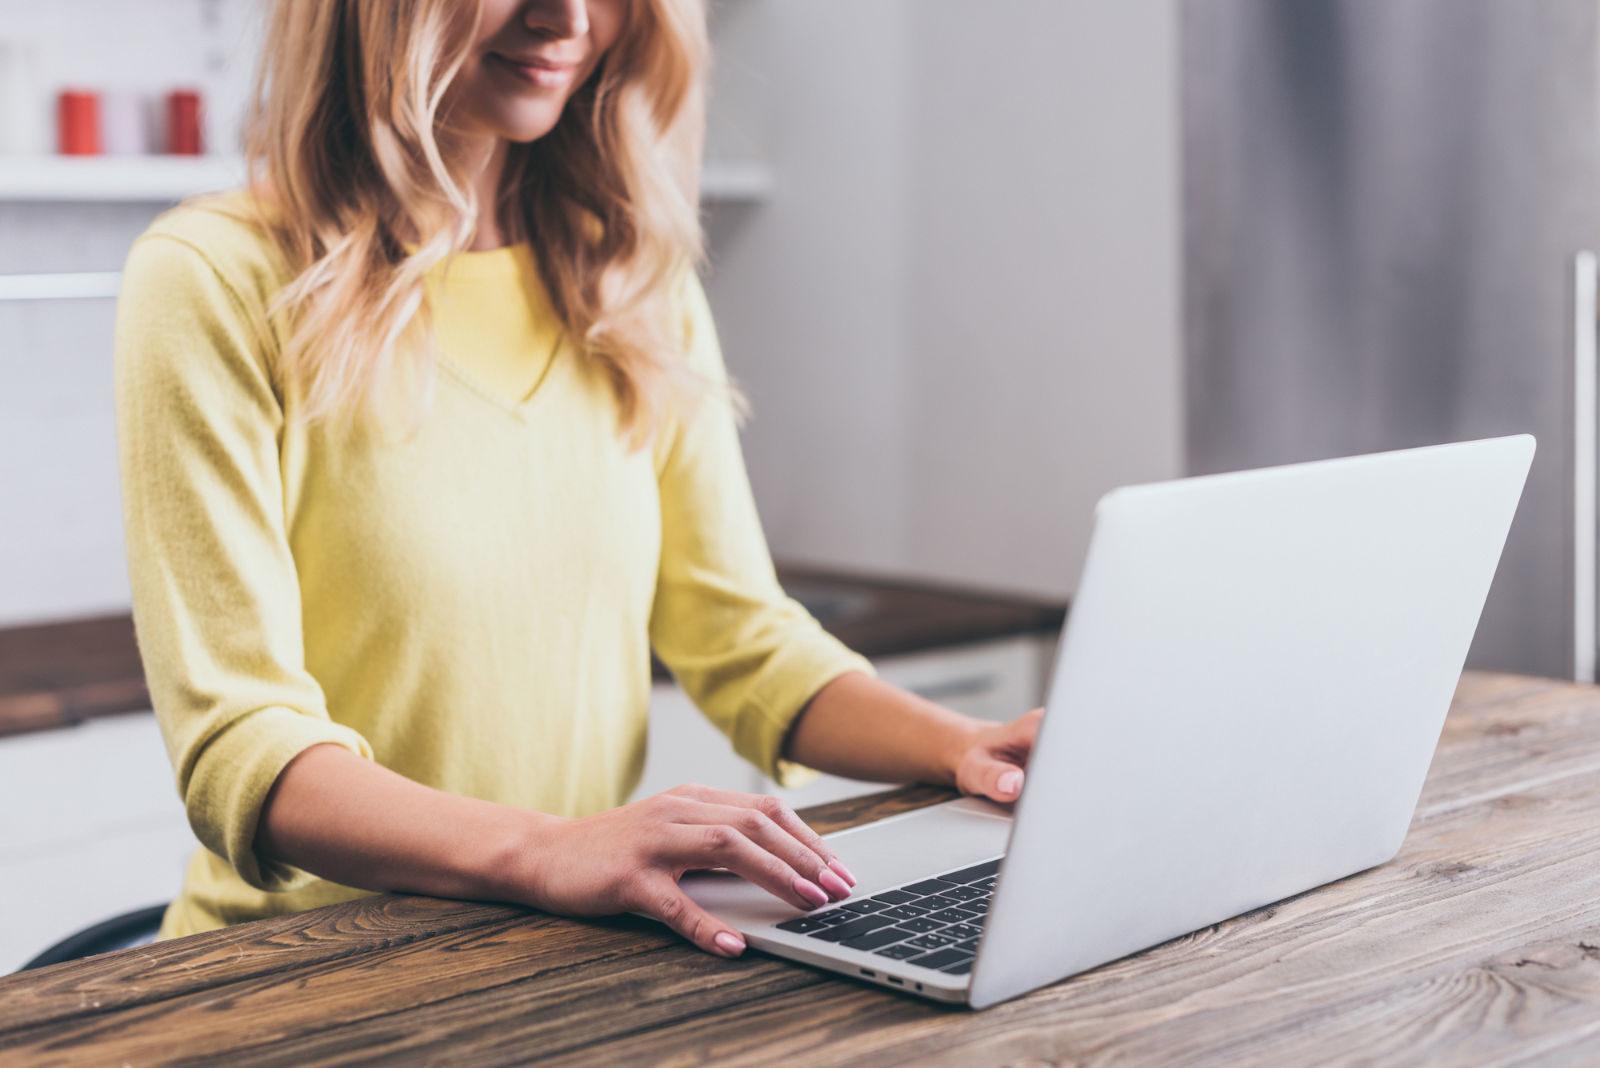 Creación de contenidos para blogs ¿Cómo crear un manual de producción?